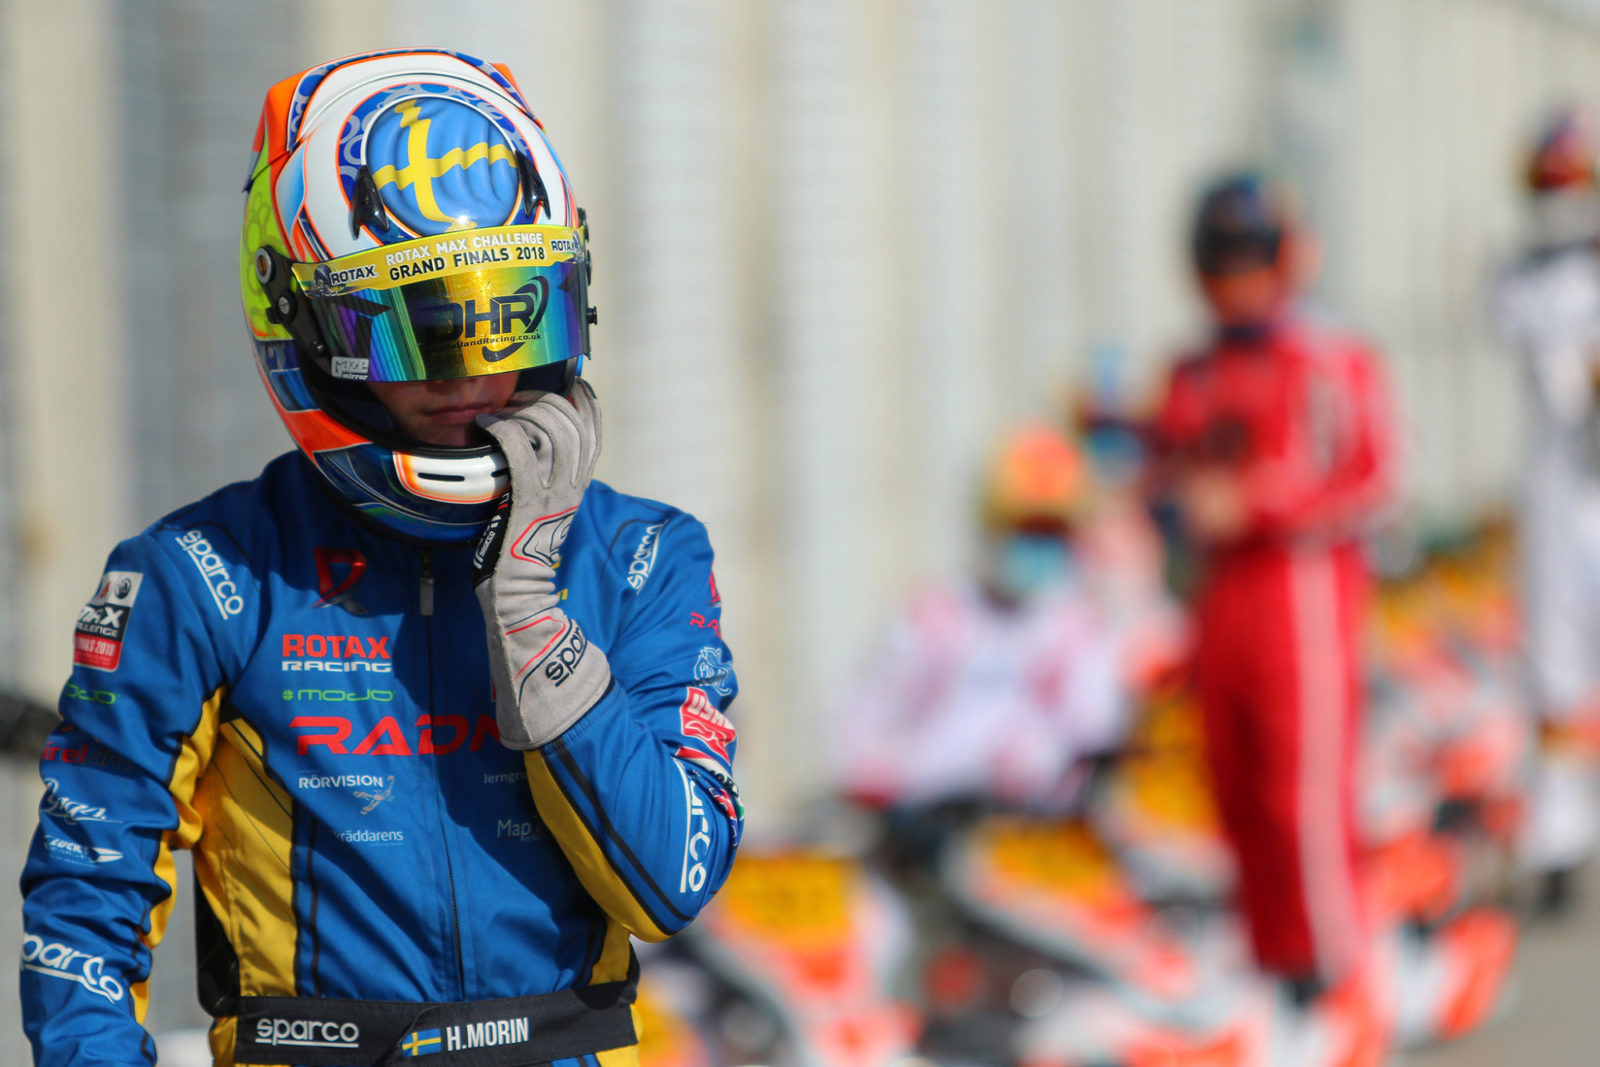 Hannes Morin 2018 Rotax MAX Challenge Grand Finals